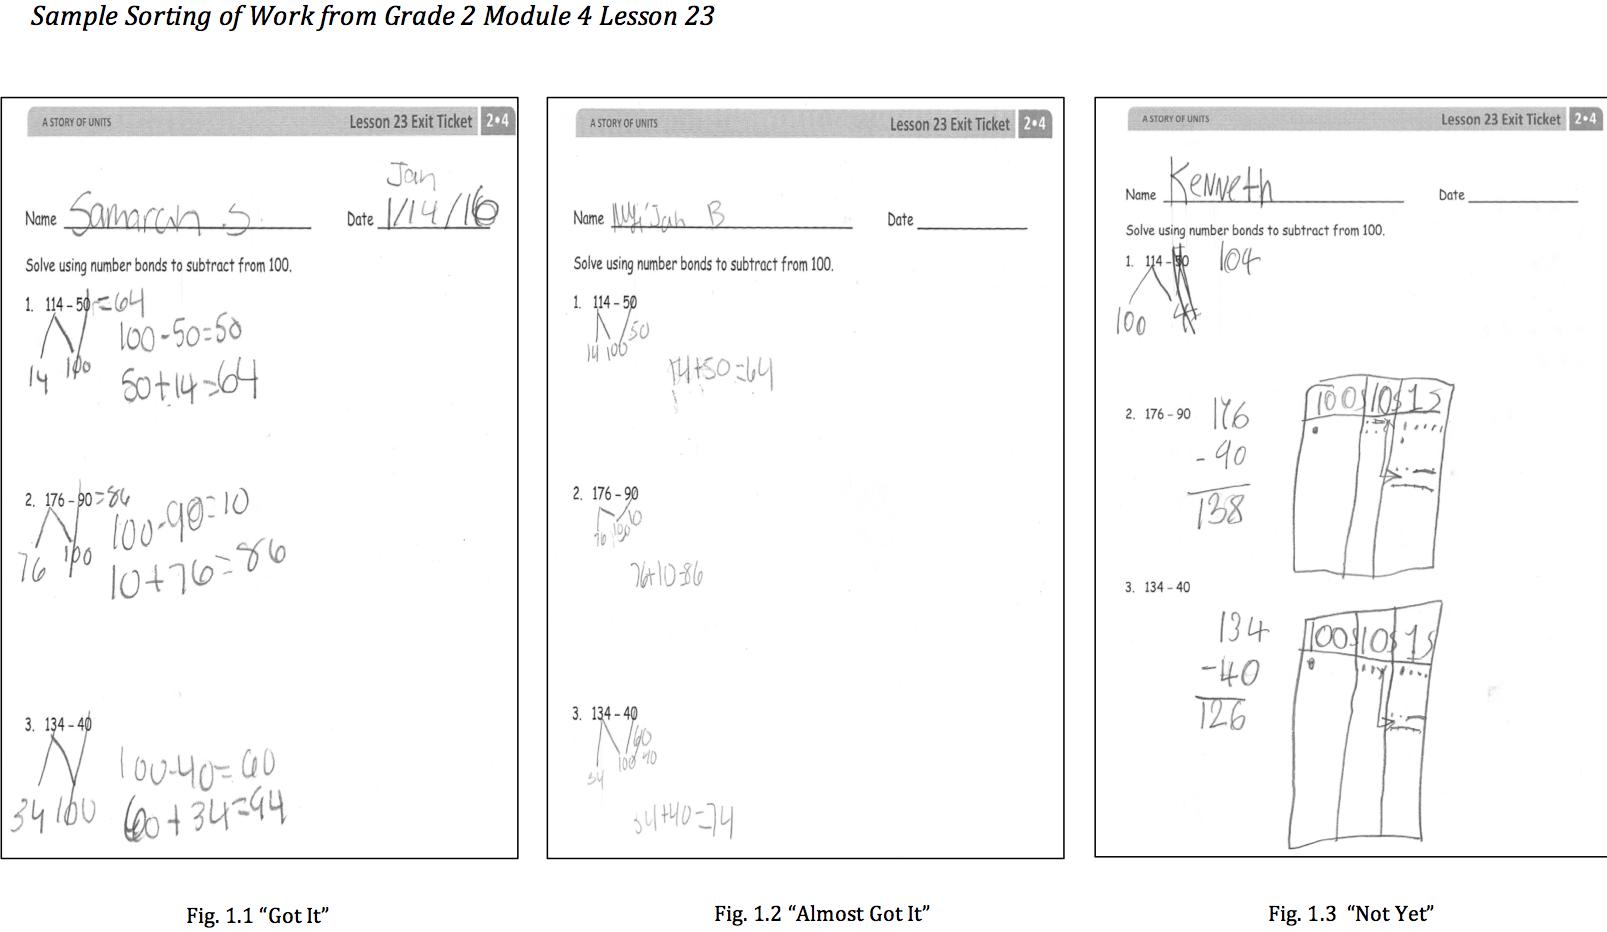 Analyzing student work for teacher reflection partnerinedu. Com.